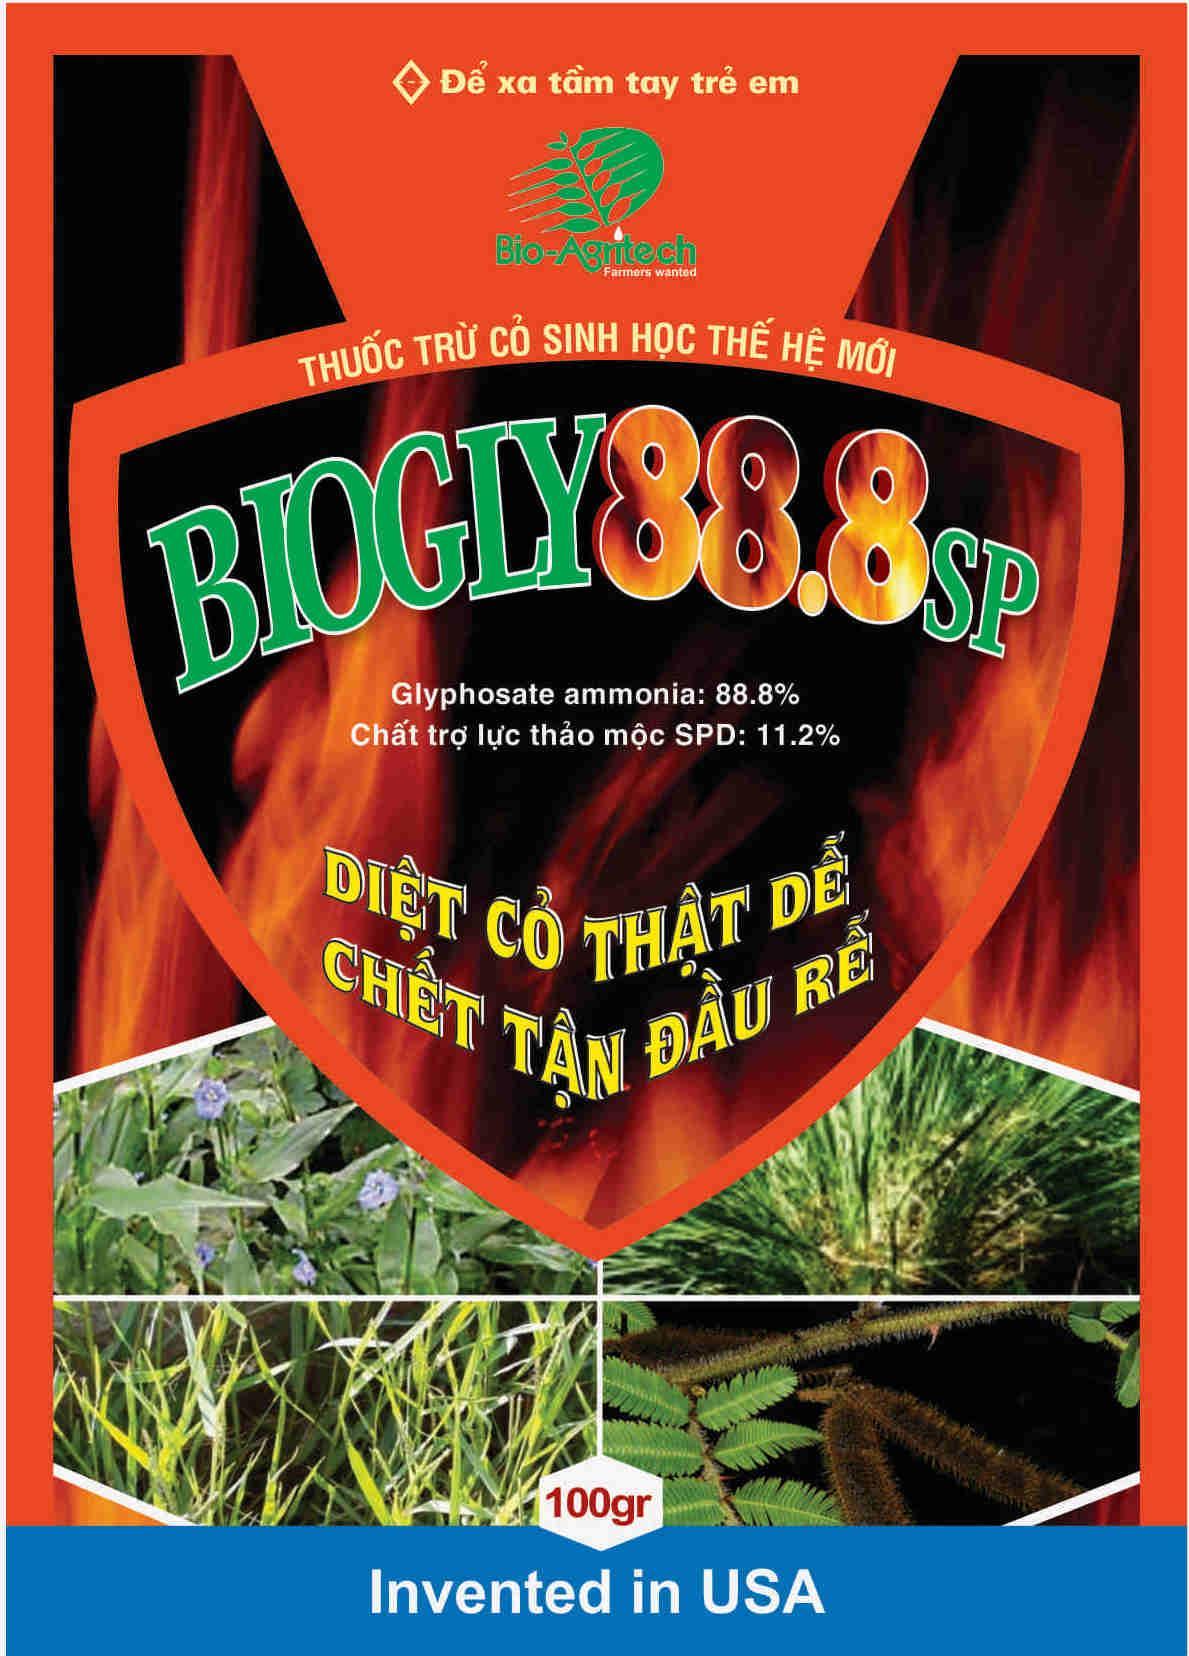 BIOGLY 88.8SP